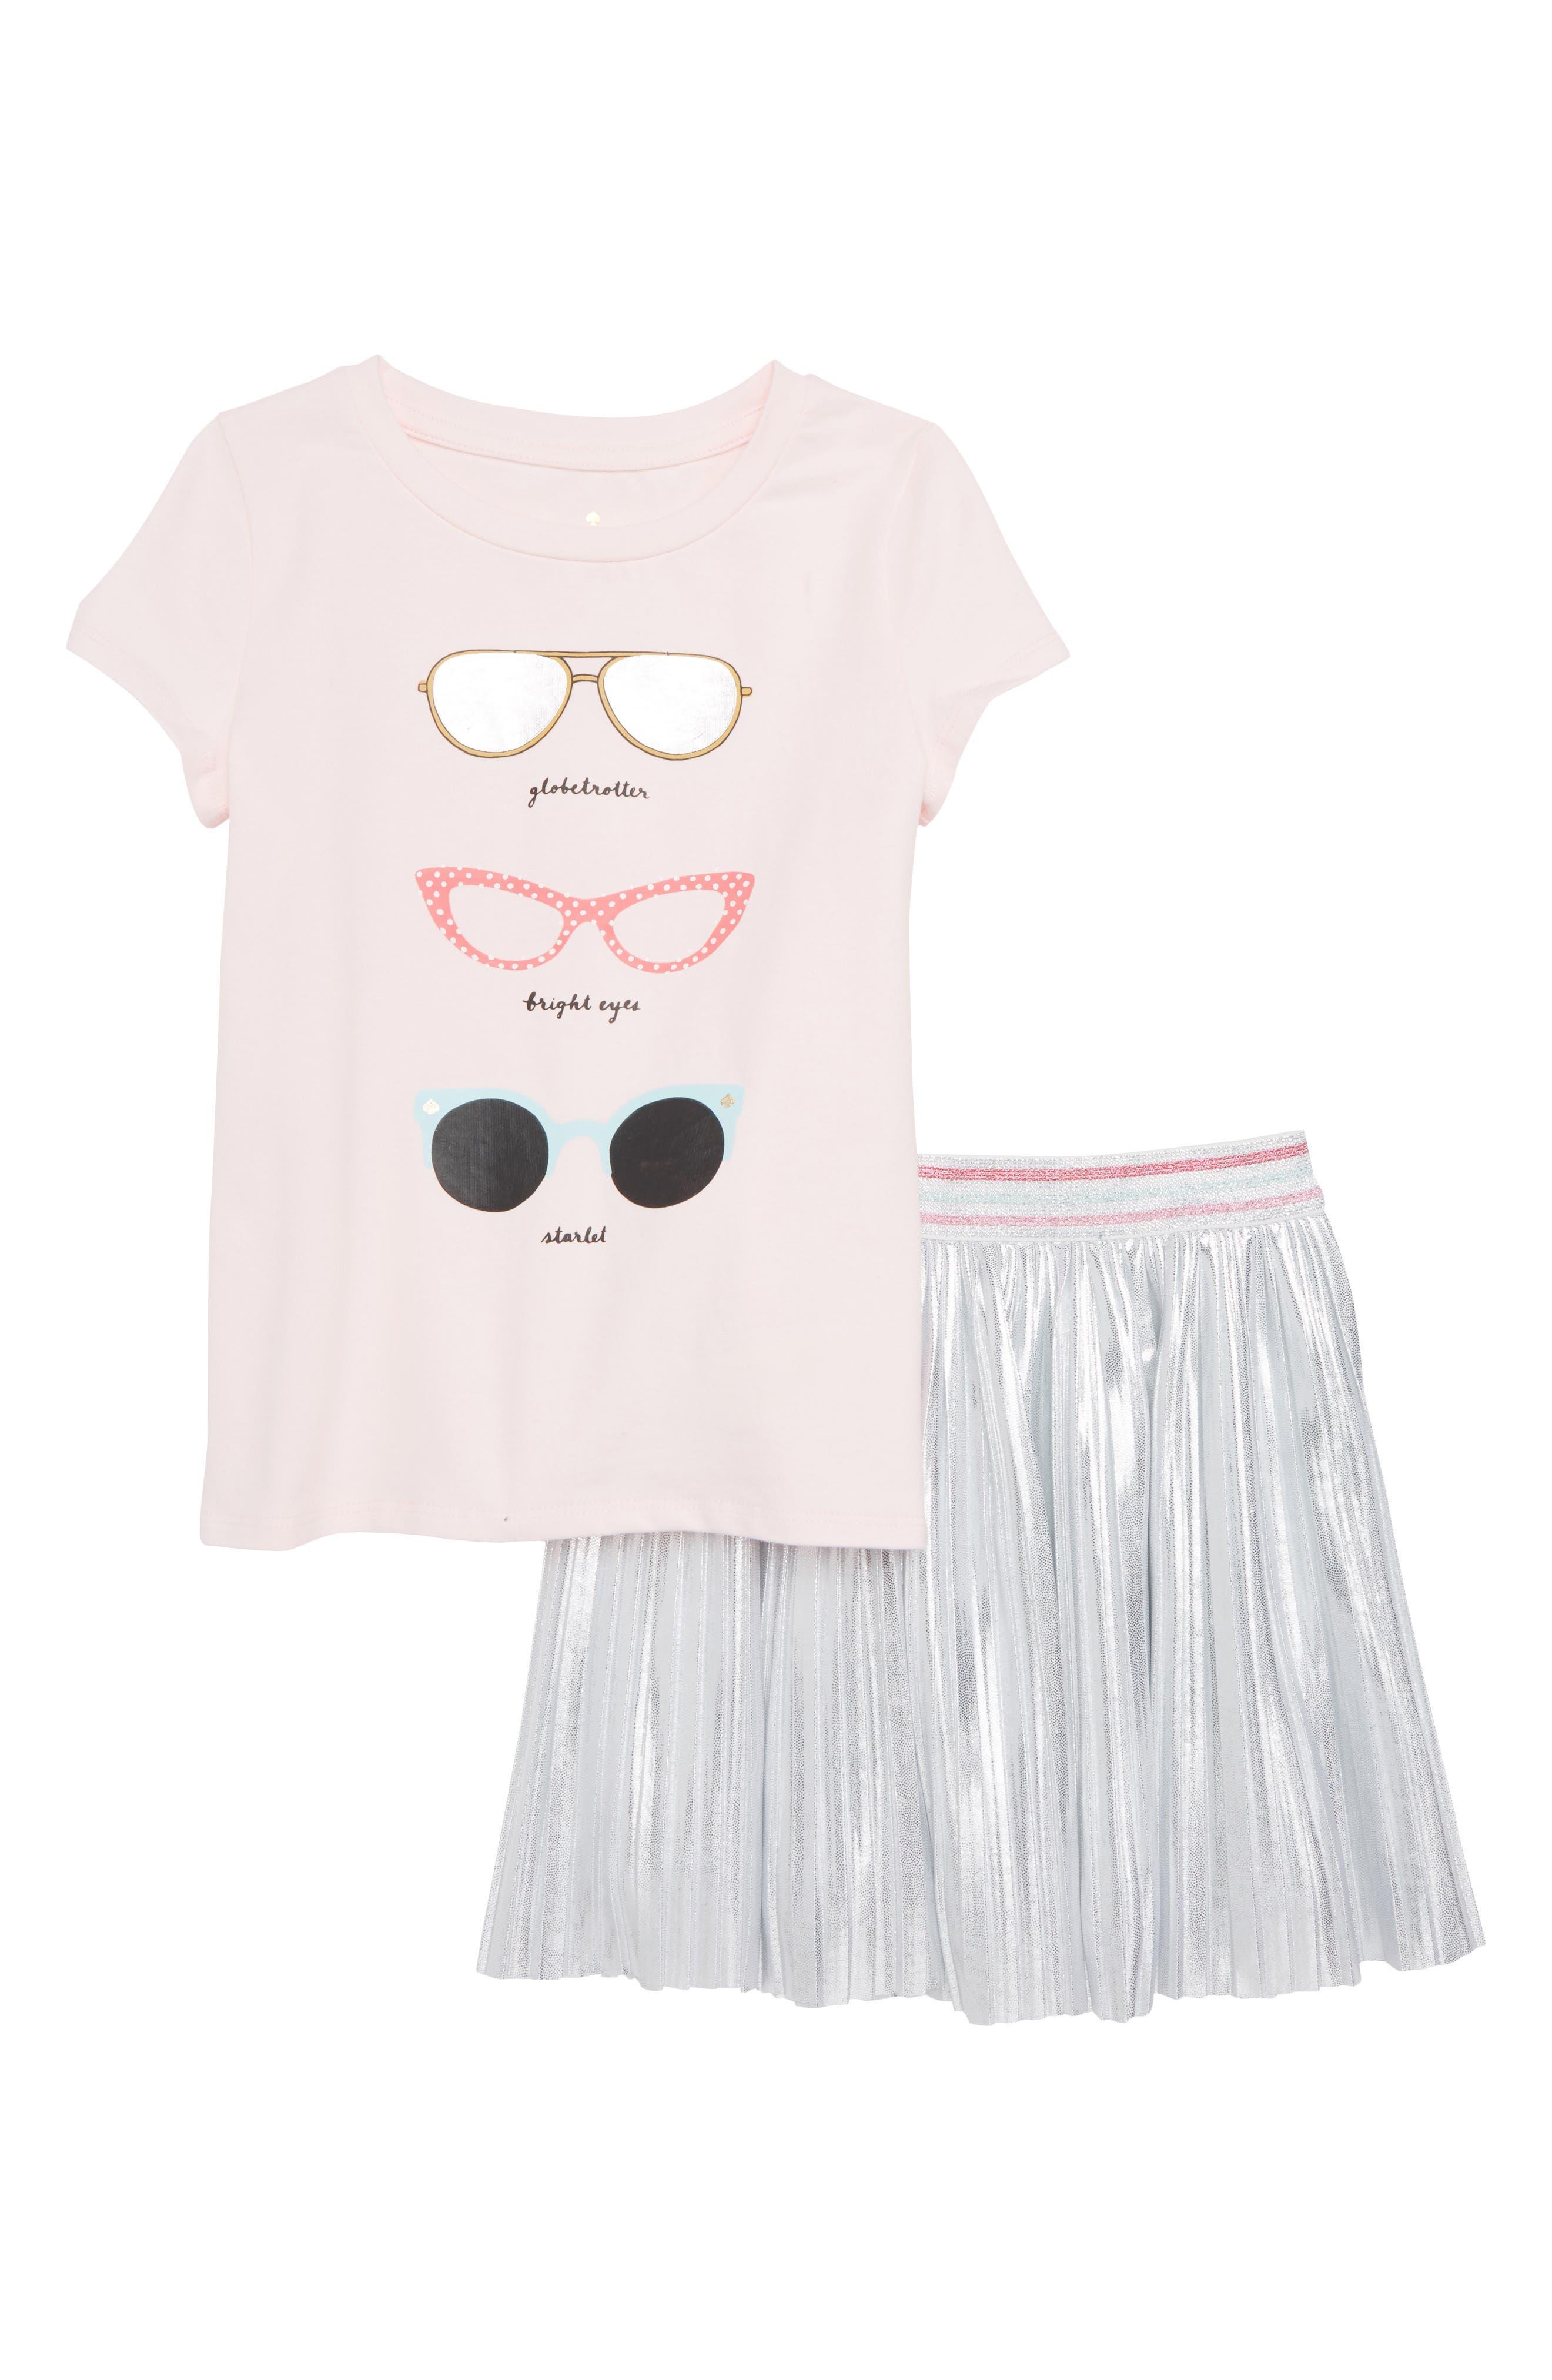 kate spade new york graphic tee & skirt set (Toddler Girls & Little Girls)